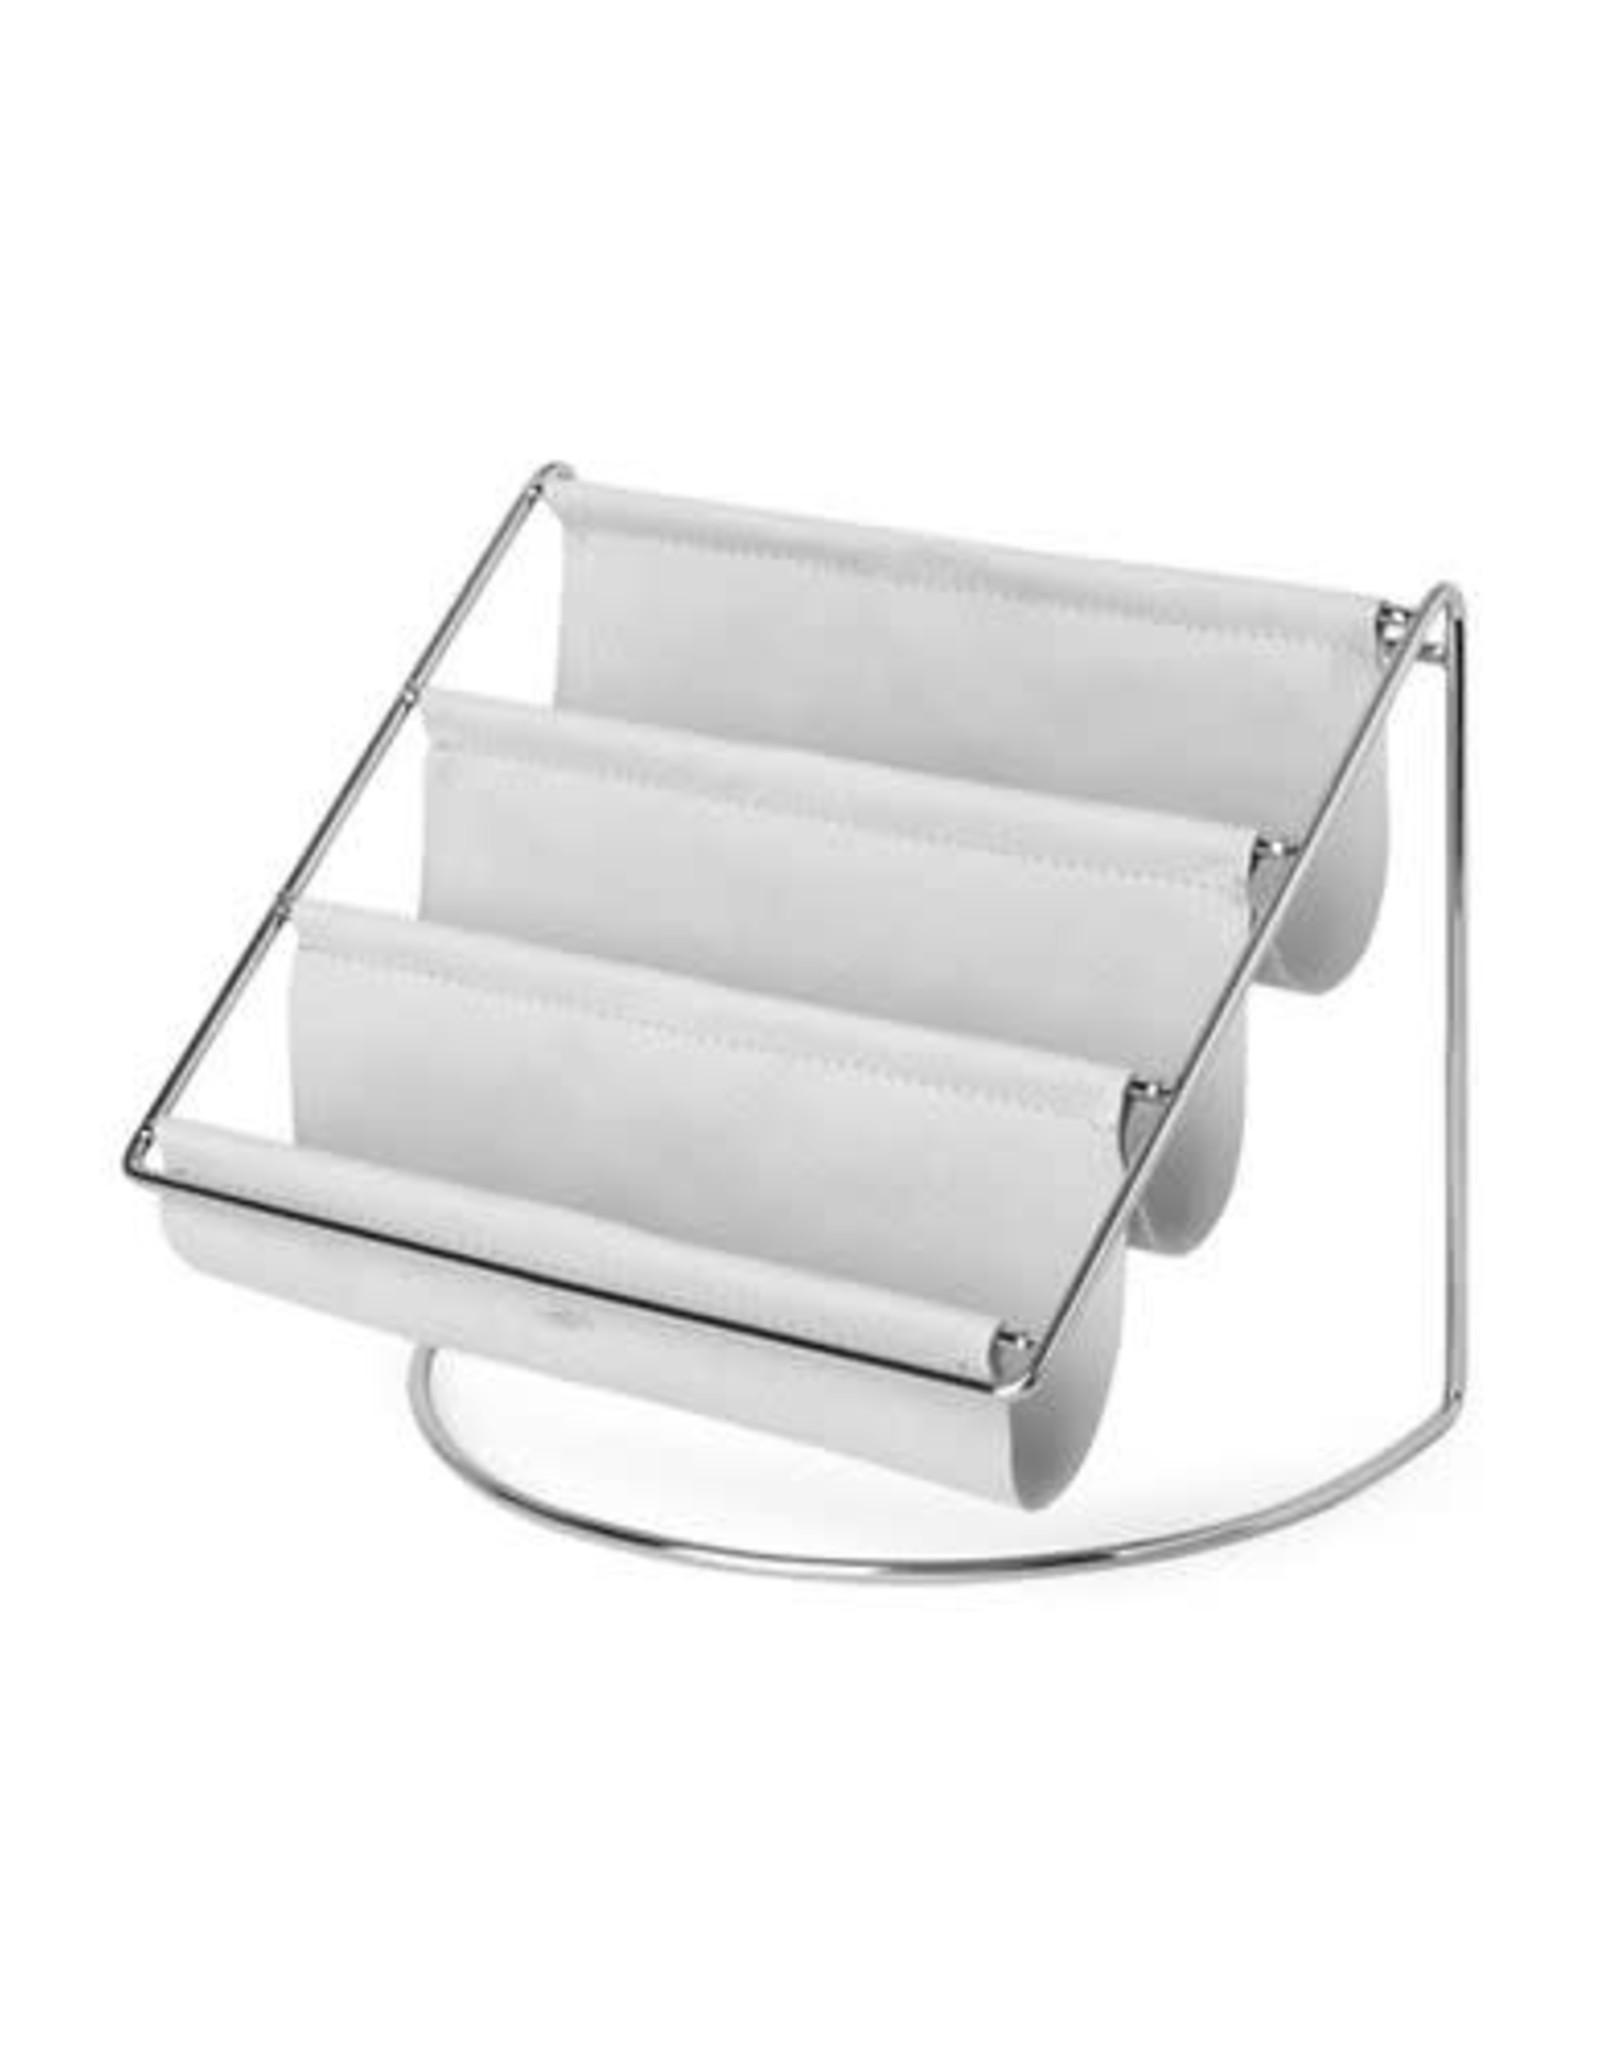 Umbra organiser - hammock (grey)